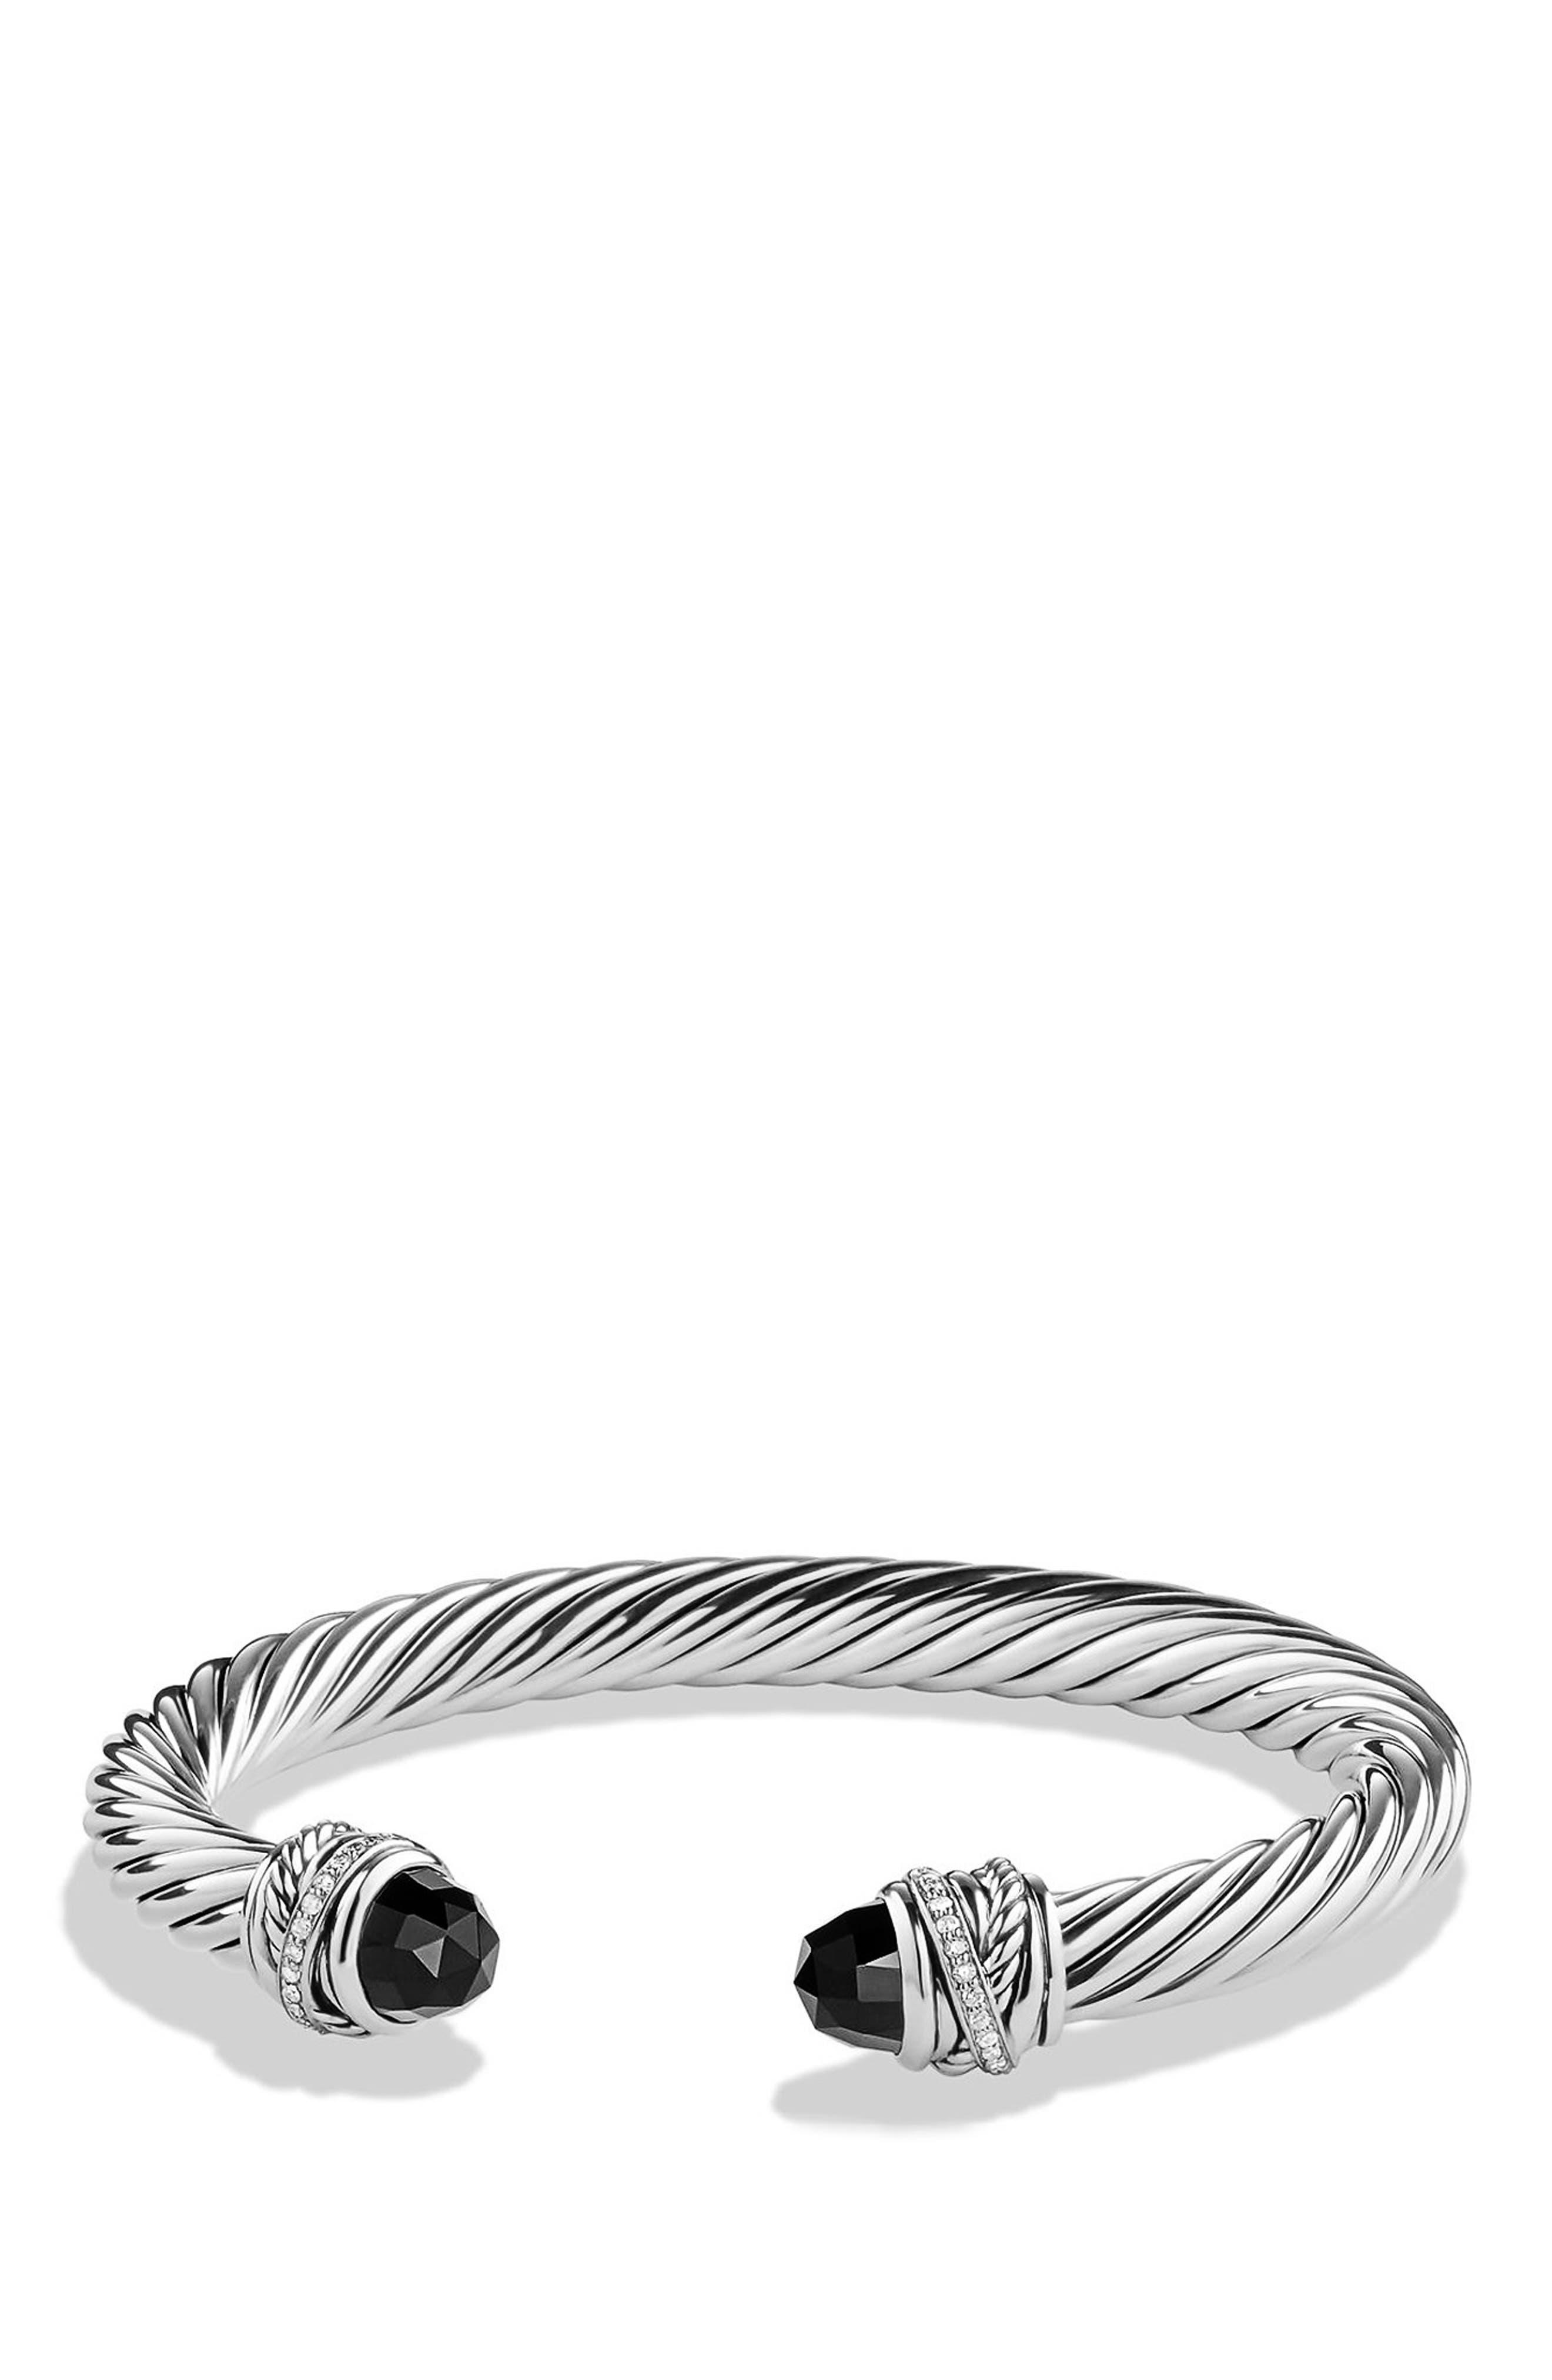 DAVID YURMAN Crossover Bracelet with Diamonds, 7mm, Main, color, BLACK ONYX